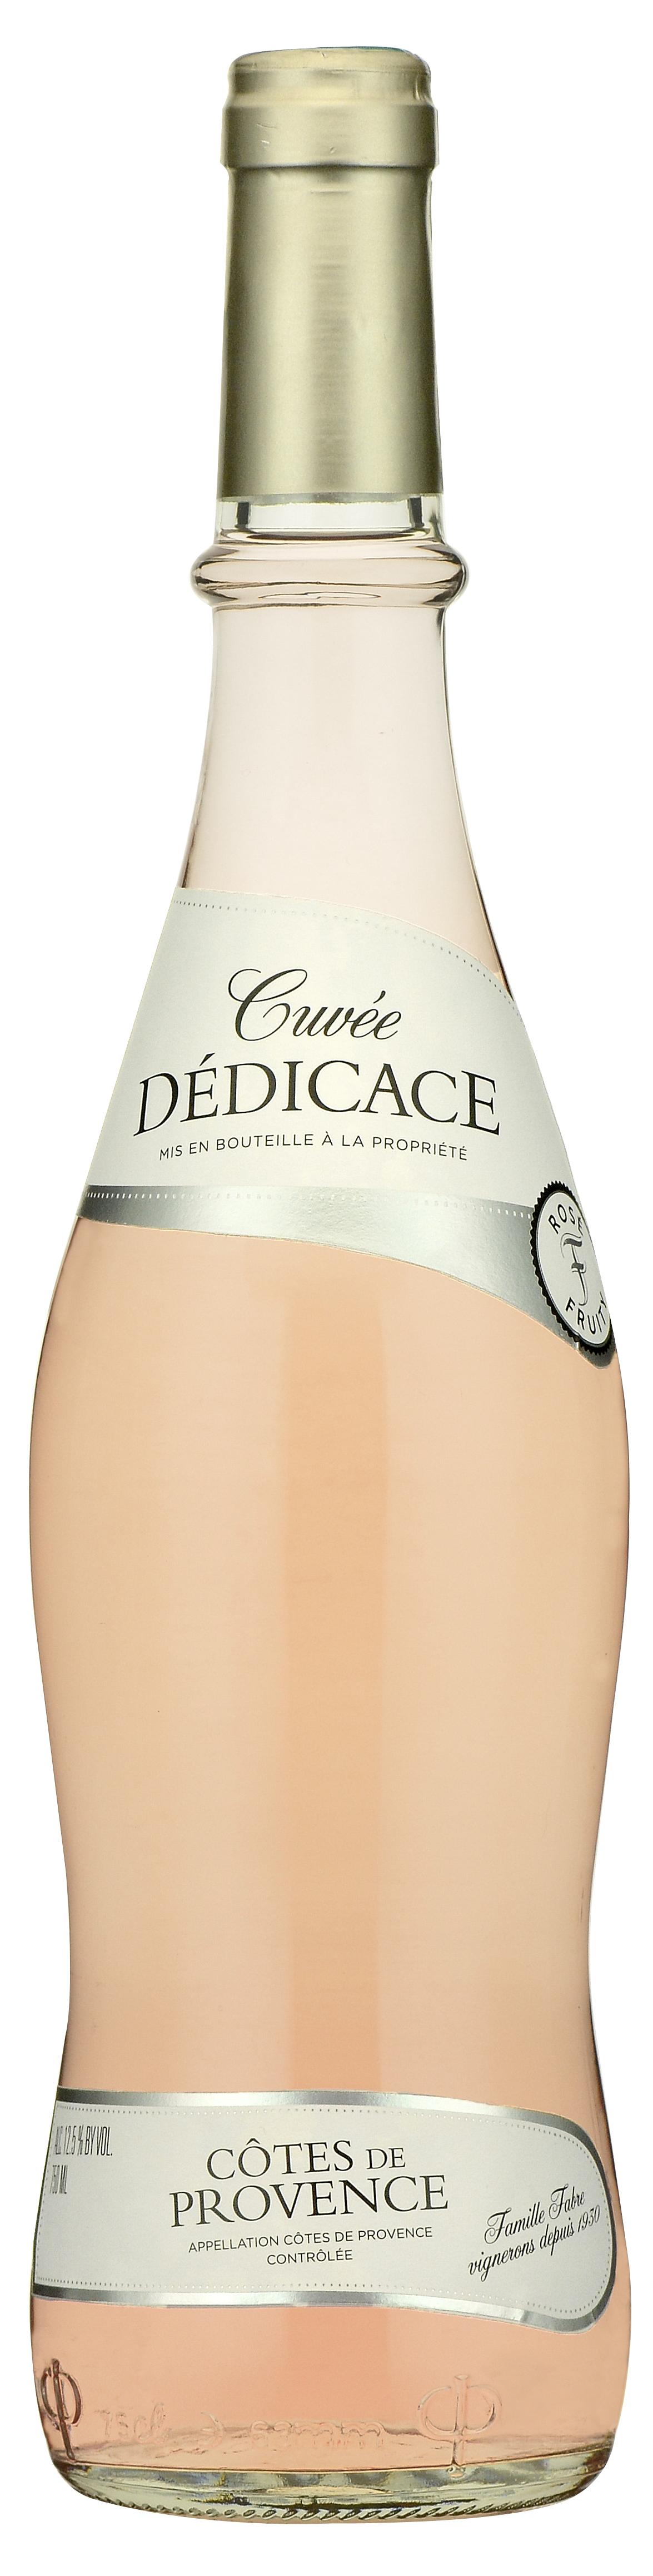 Dedicace Provence Rose